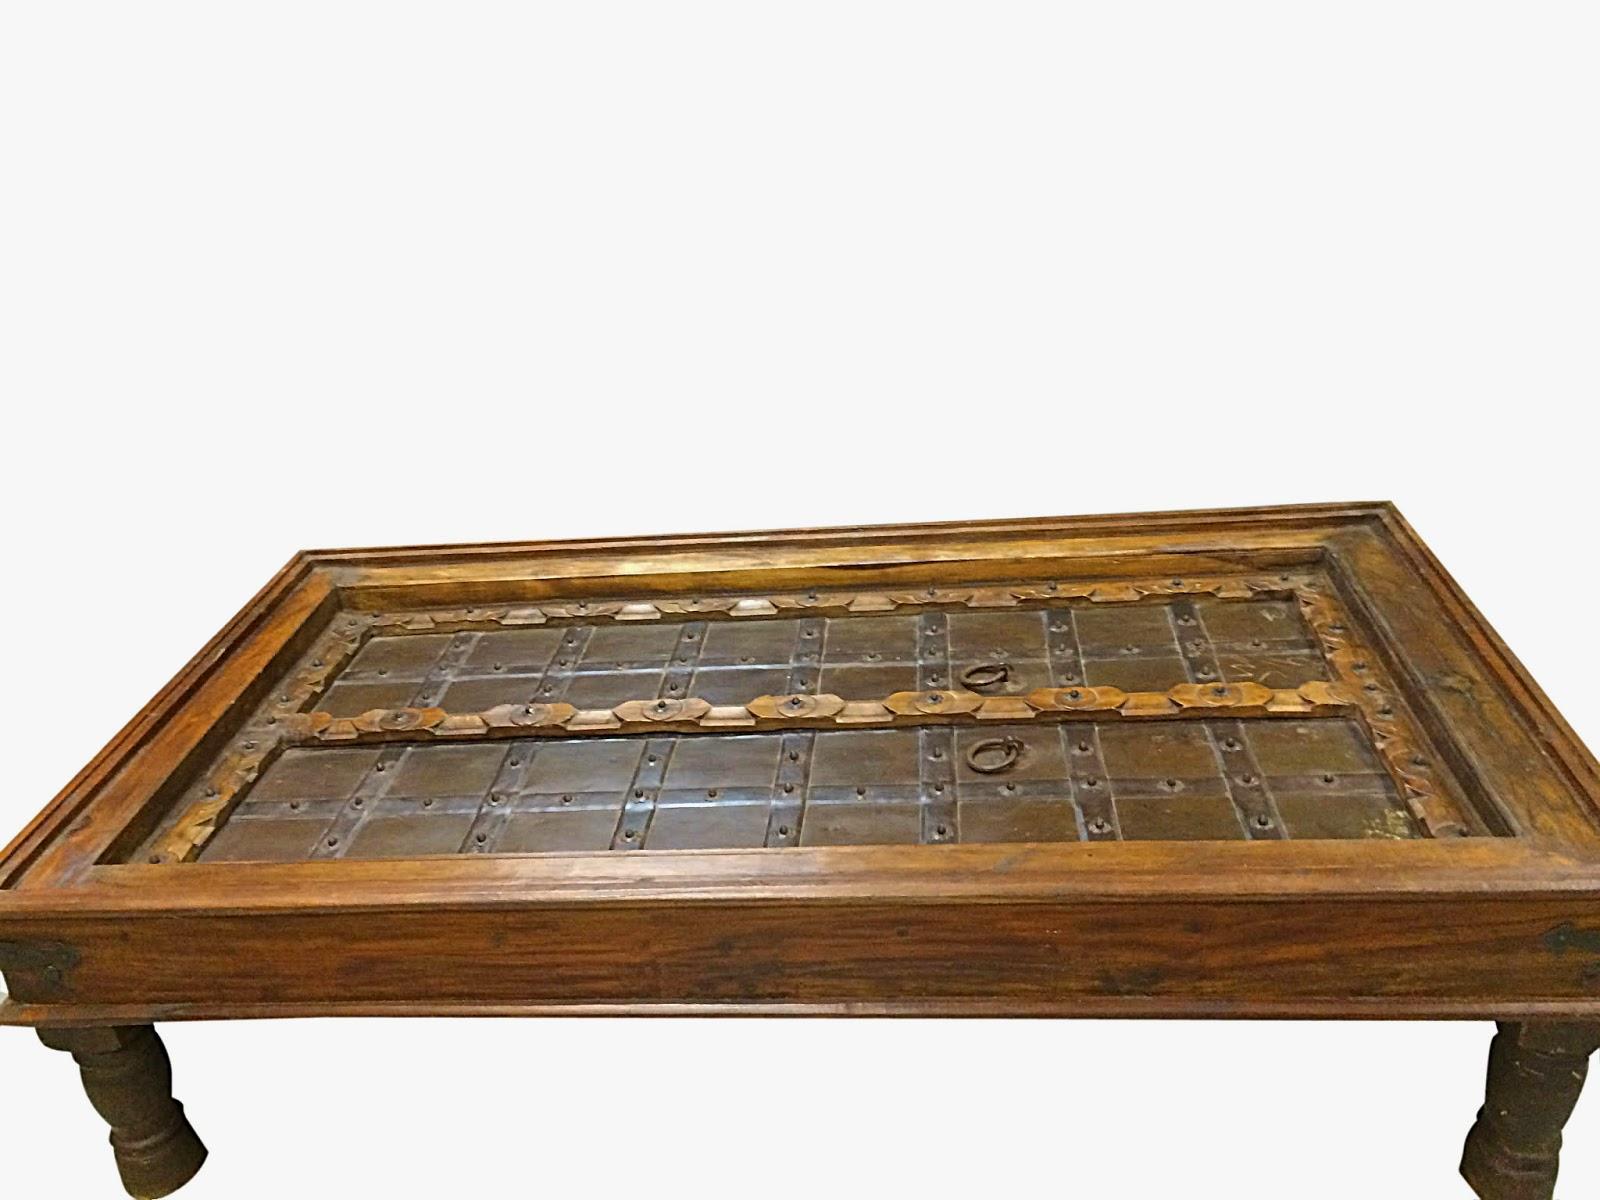 Mogul interior designs antique coffee table interiorlove for Mogul interior designs